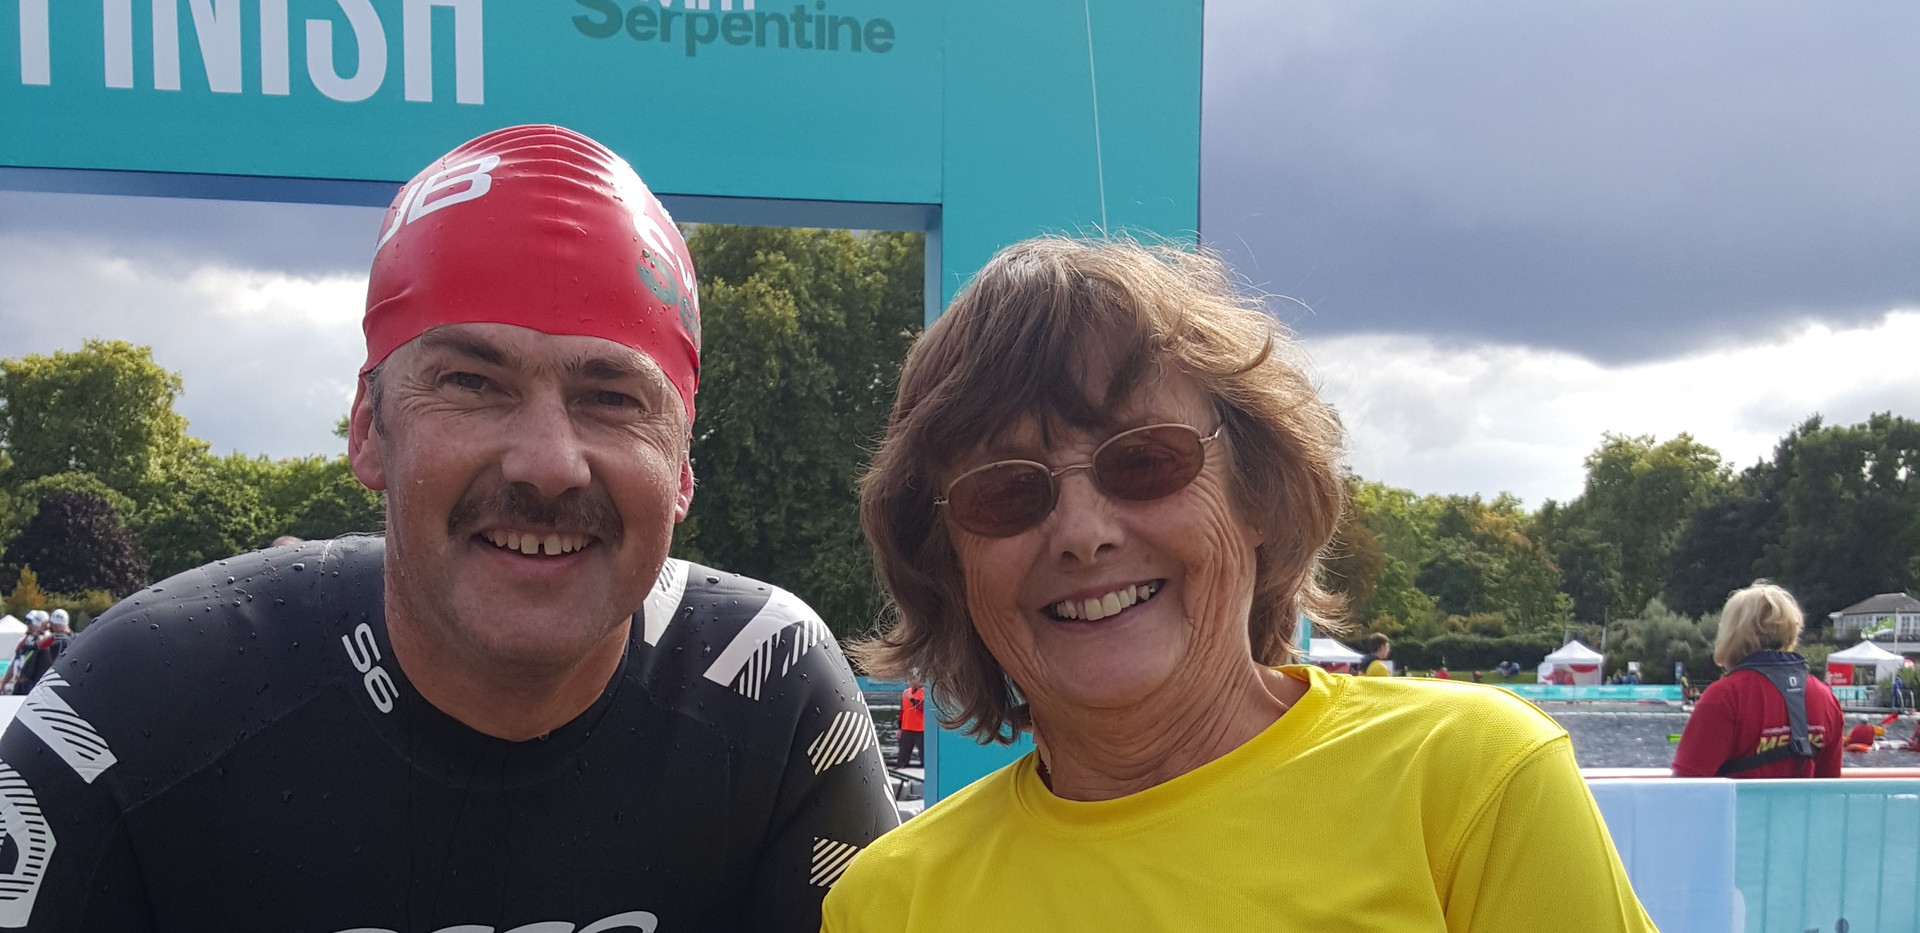 Peter_King_&_Jenny_Ball_2_post_Swim_Serp